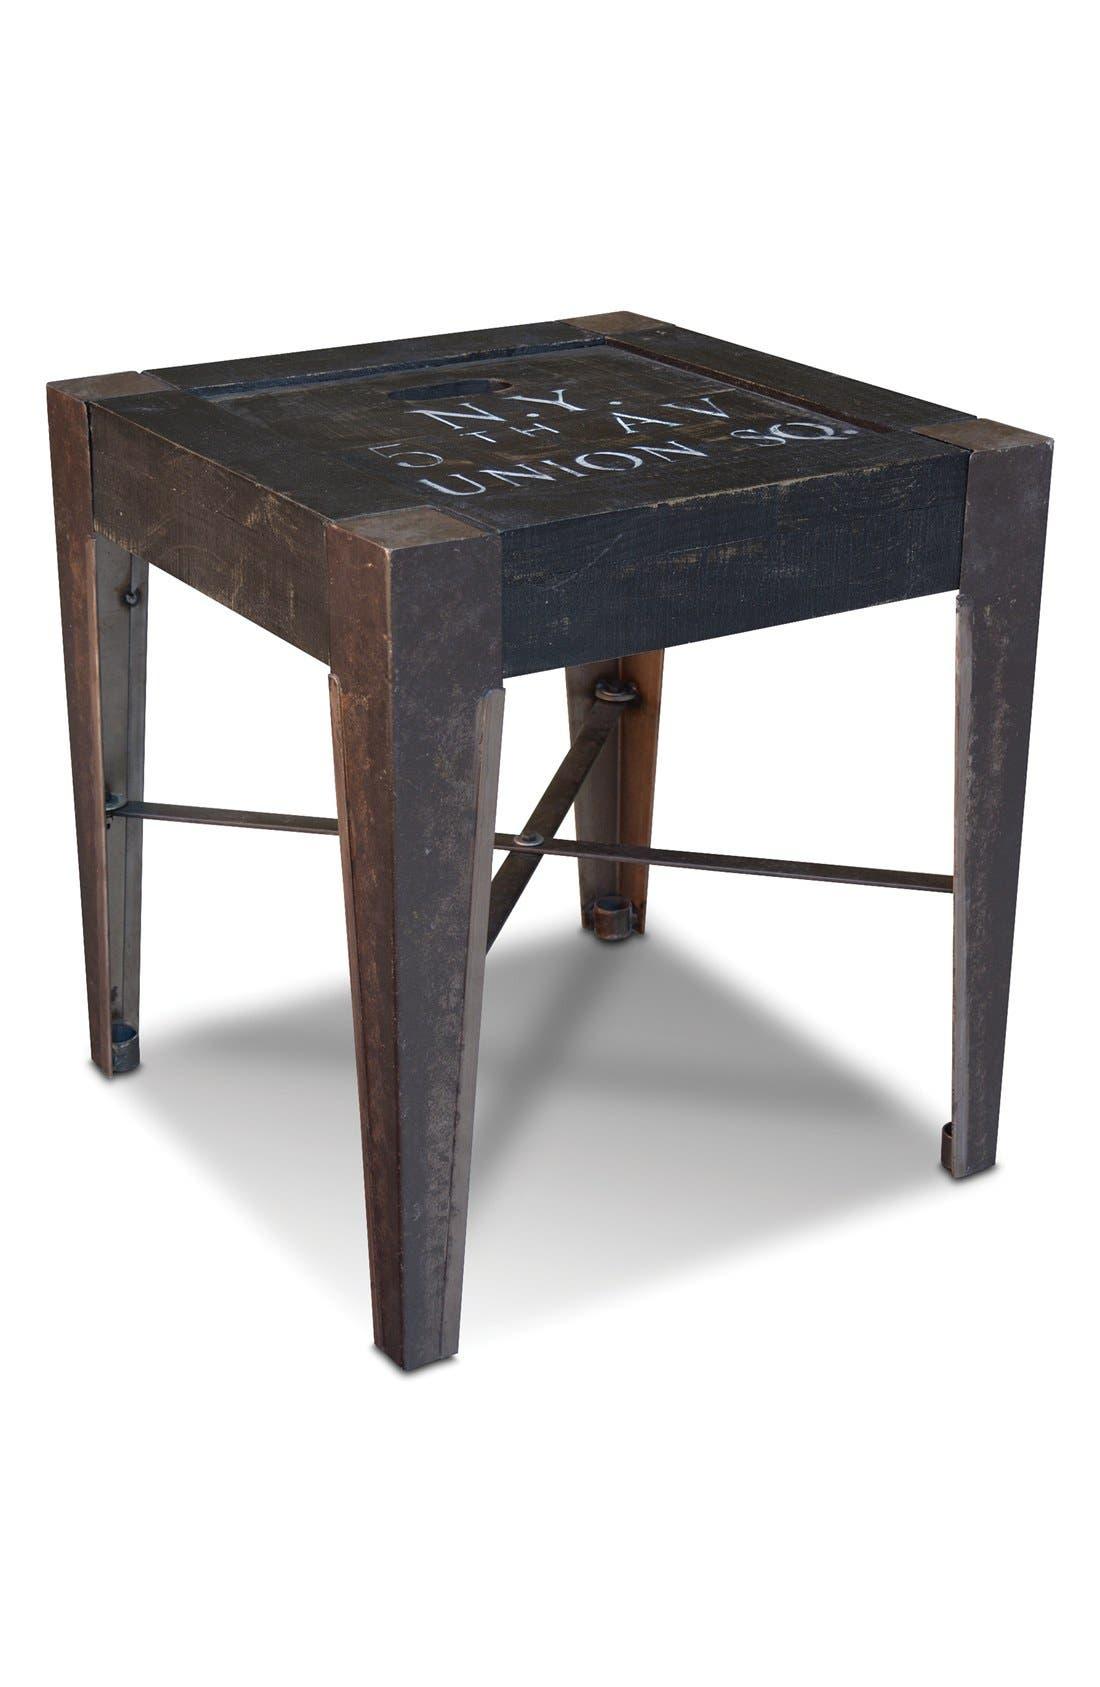 Alternate Image 1 Selected - Horizon Home 'Graffiti' End Table